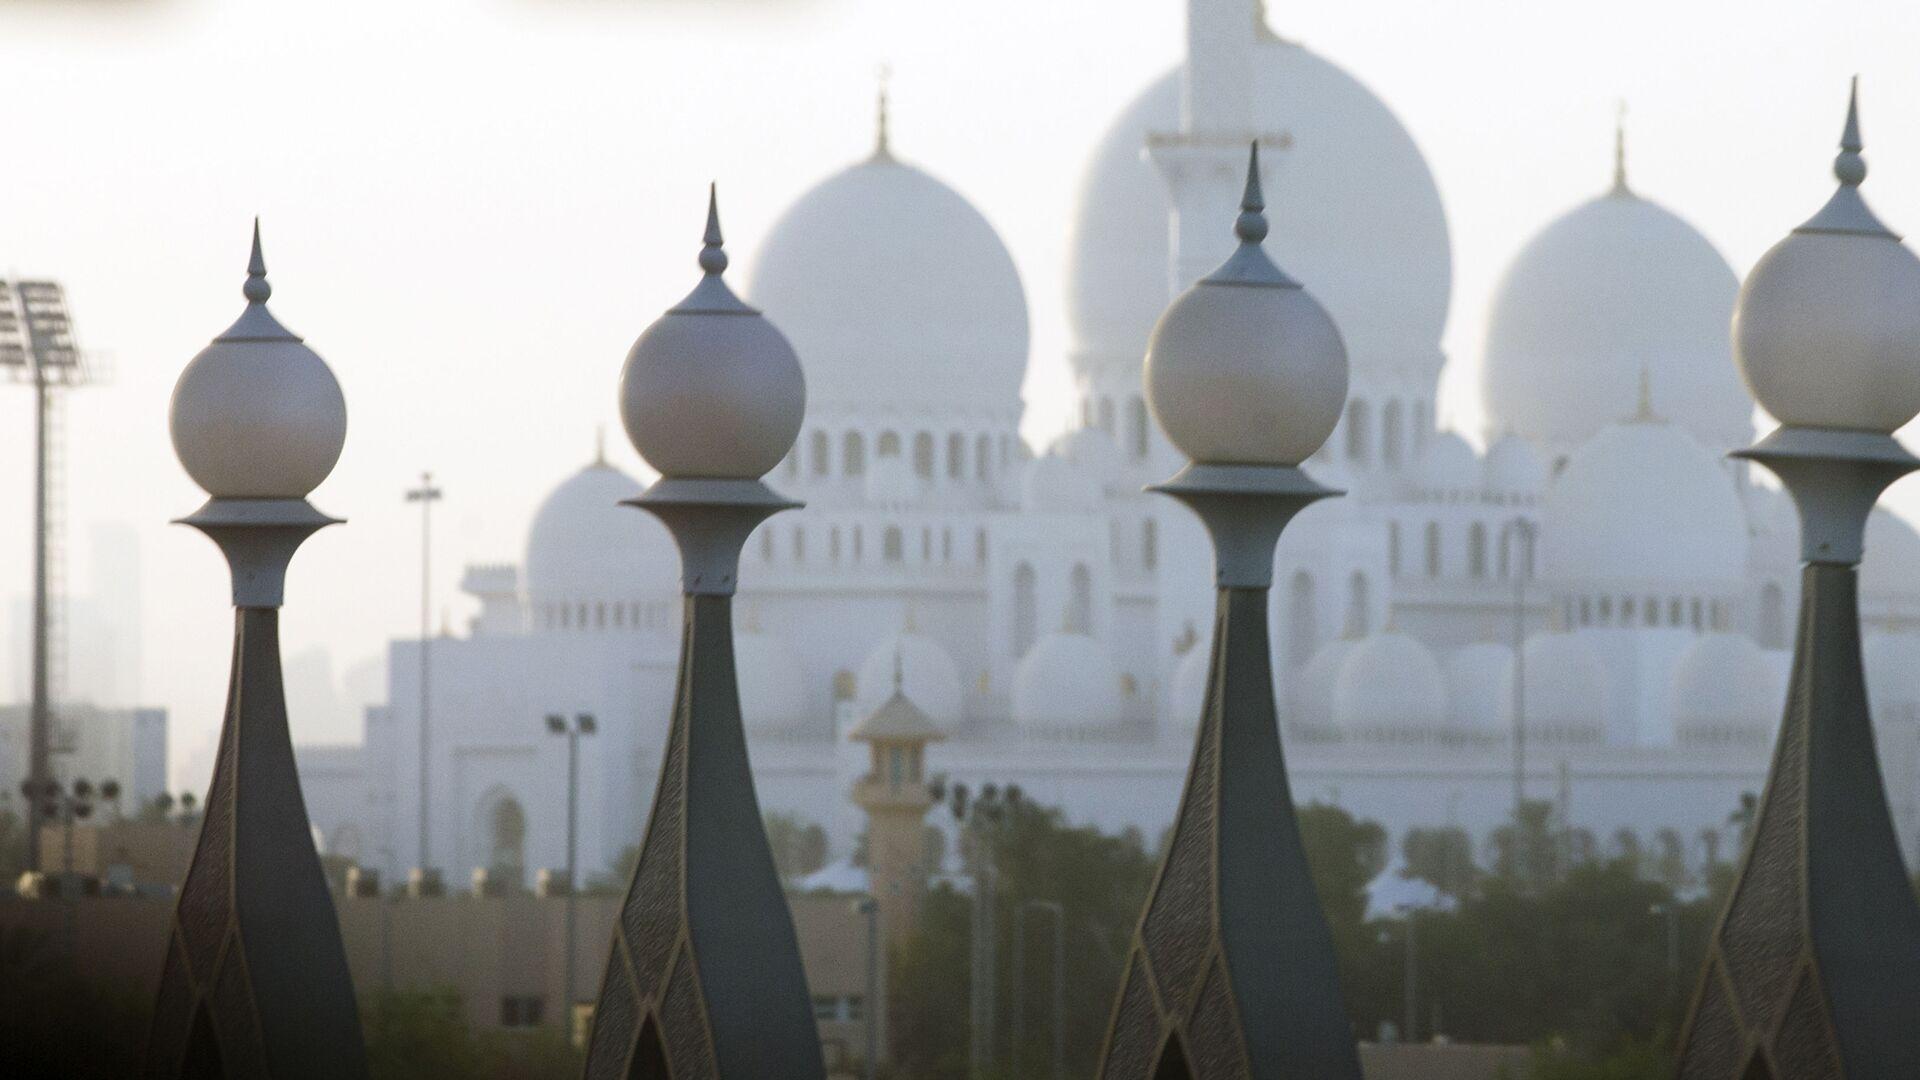 Abu Dhabi, capitale degli Emirati Arabi Uniti - Sputnik Italia, 1920, 09.02.2021